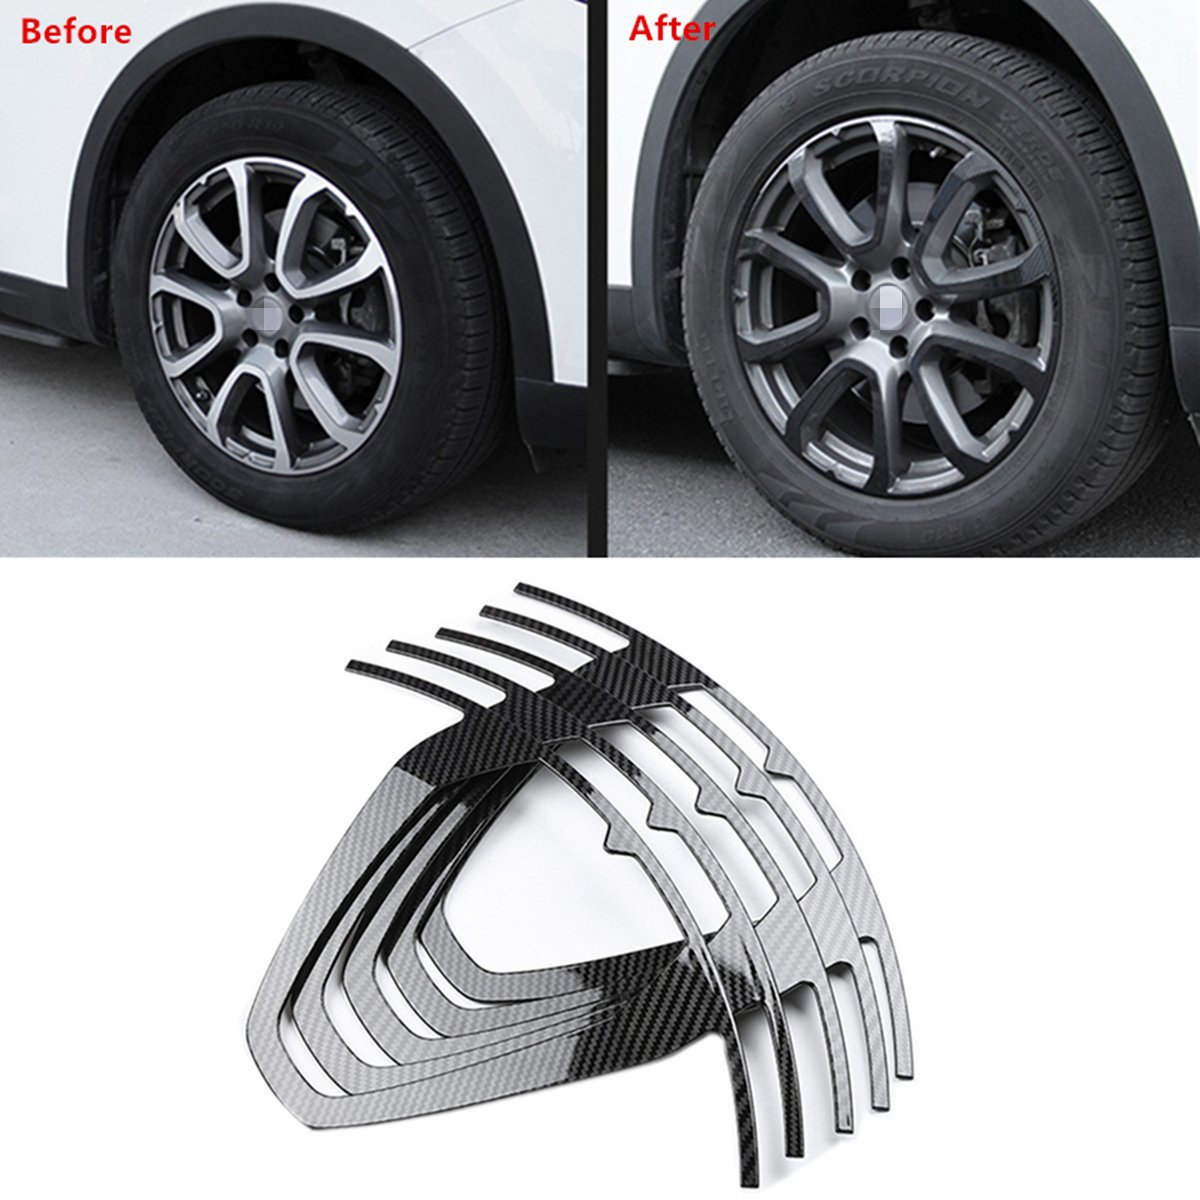 YOCTM Black Carbon Fiber Wheel Hub Trim Sticker Exterior Decoration For Maserati Levante 19 inch Wheel (5 Pack)